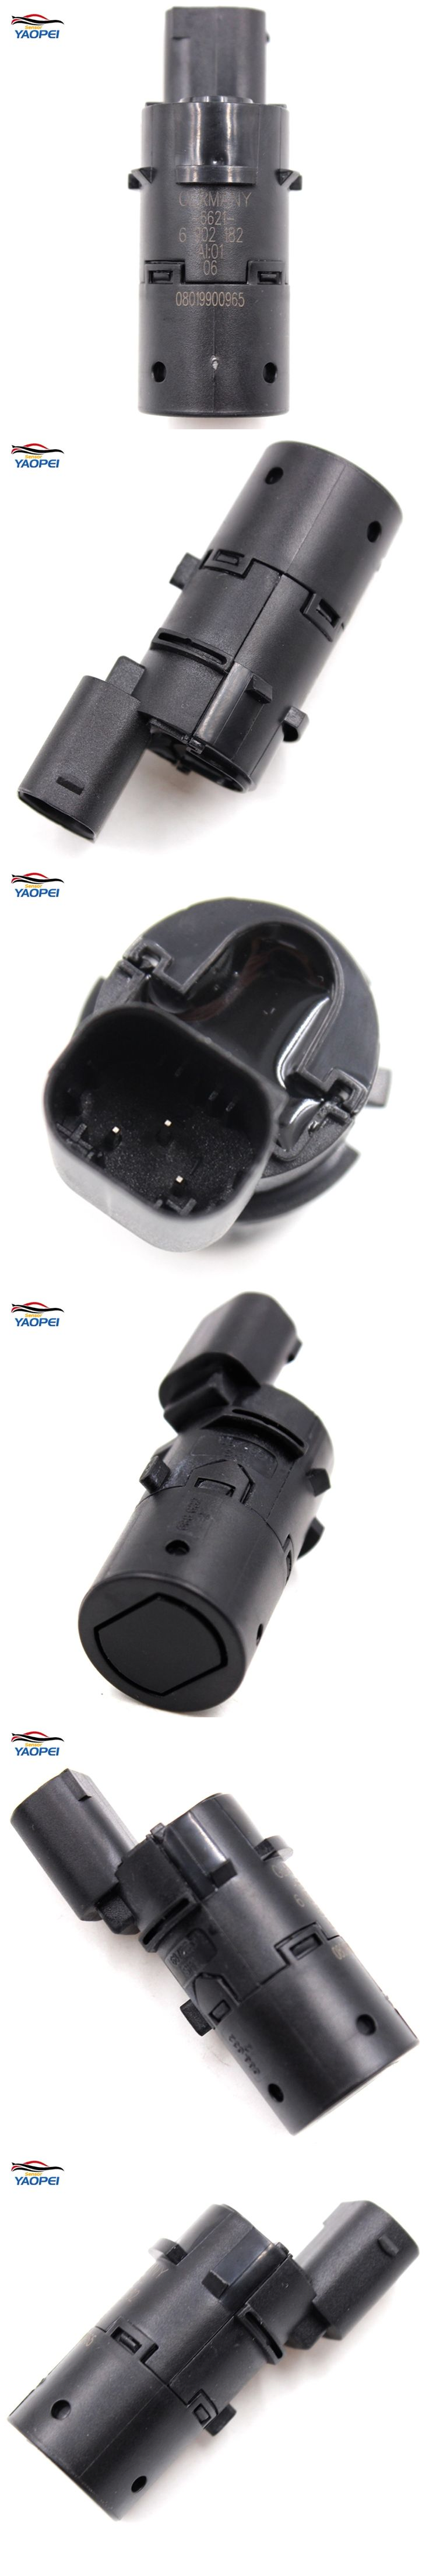 YAOPEI Car reverse Parking sensor PDC 66216902182 6902182 For BMW E38 E39 E53 525 X5 725 730 530